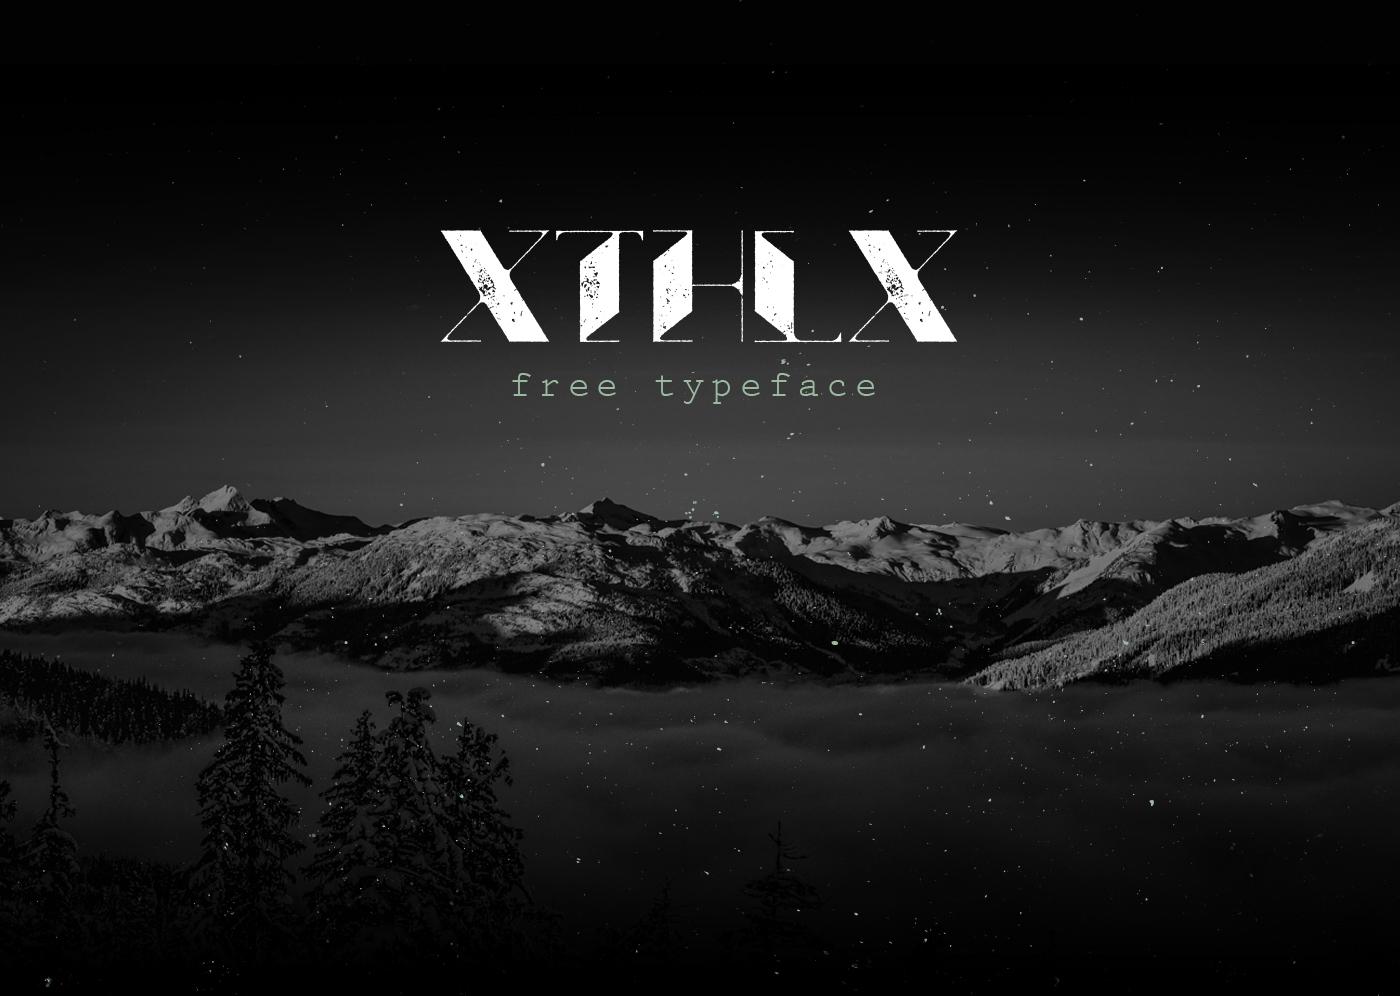 Xthlx – Free Futuristic Font Poster A